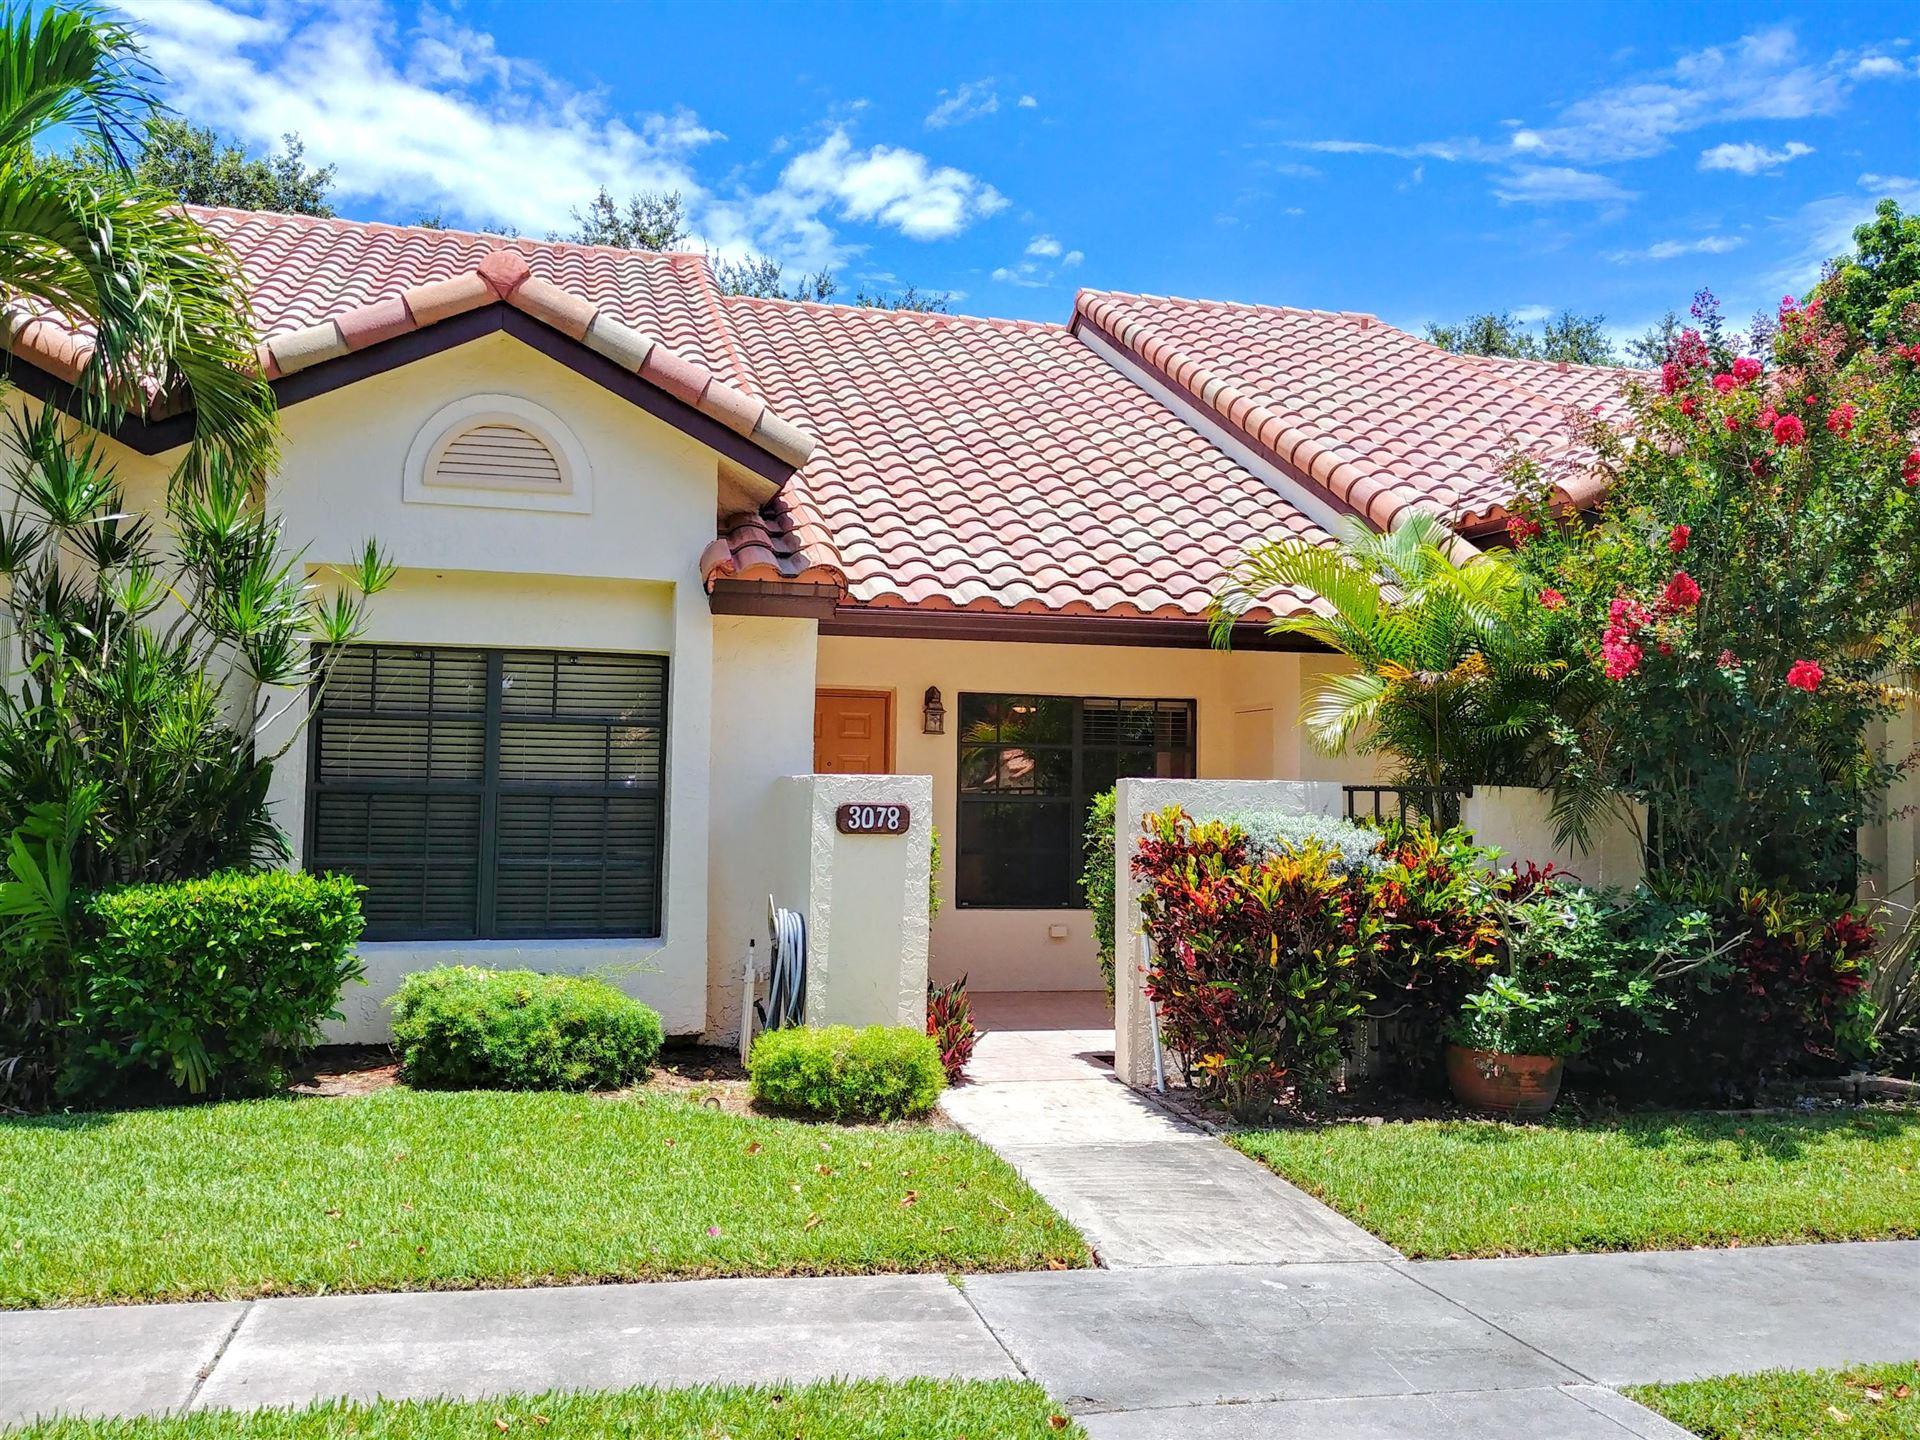 3078 Inglewood Ter Terrace, Boca Raton, FL 33431 - #: RX-10632512